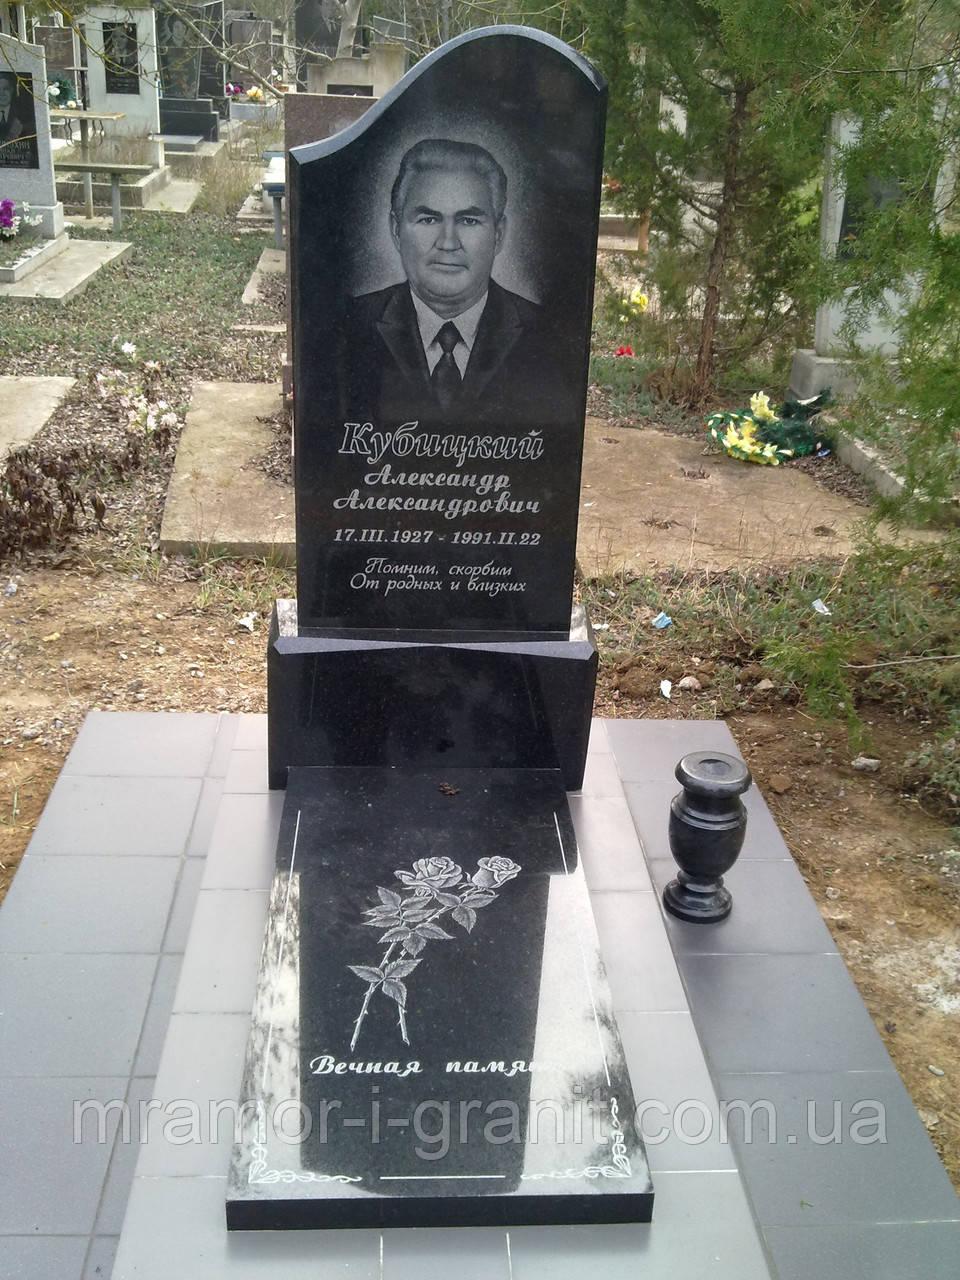 Изготовление памятников адреса юридического лица надгробная плита анапа цена